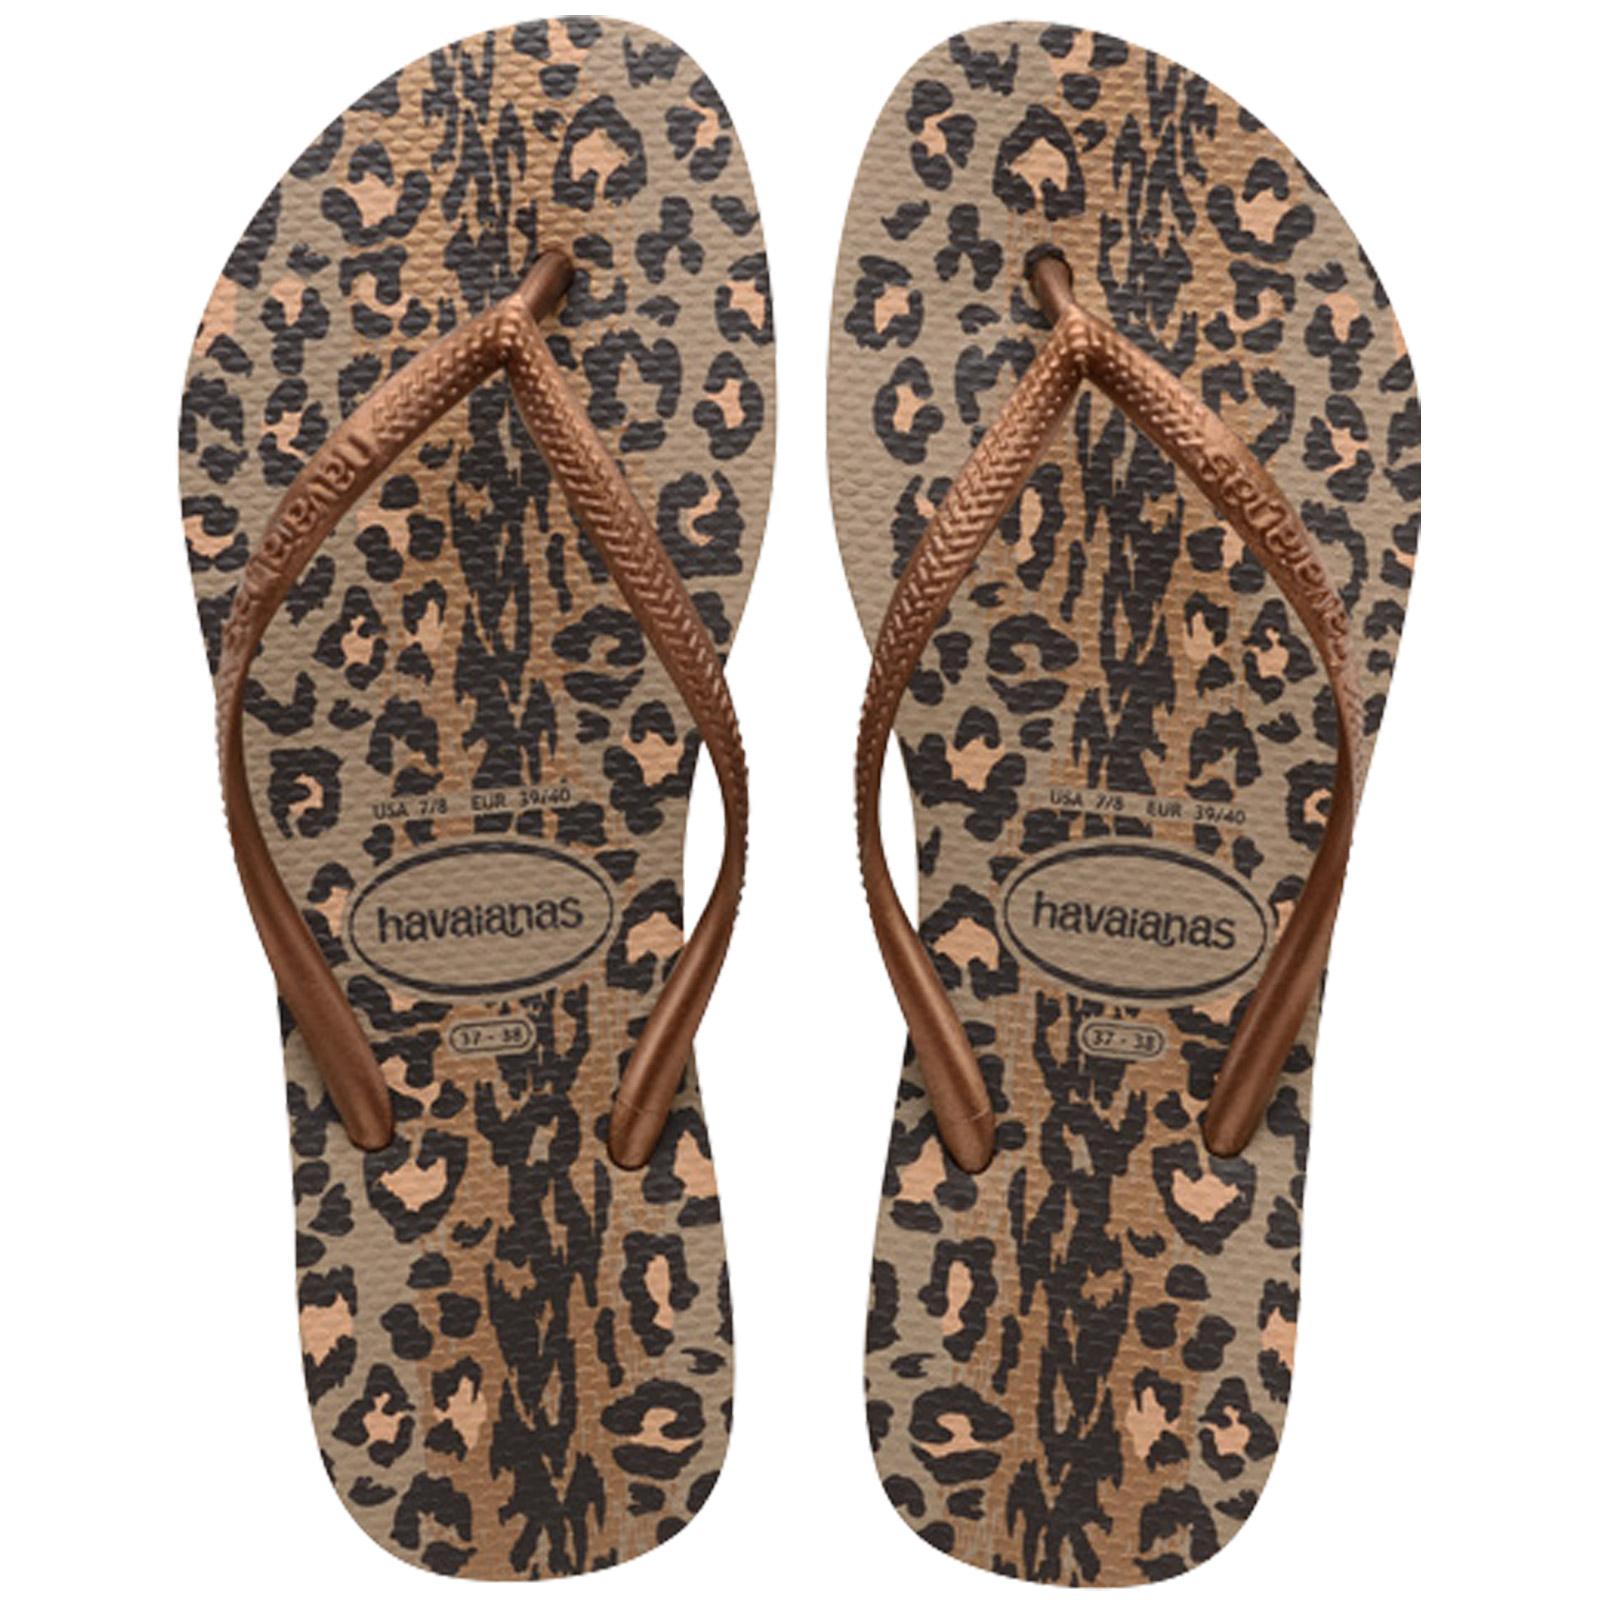 a24f618752de92 Flip-Flops Slim Animals Rose Gold-dark Copper - Brand Havaianas